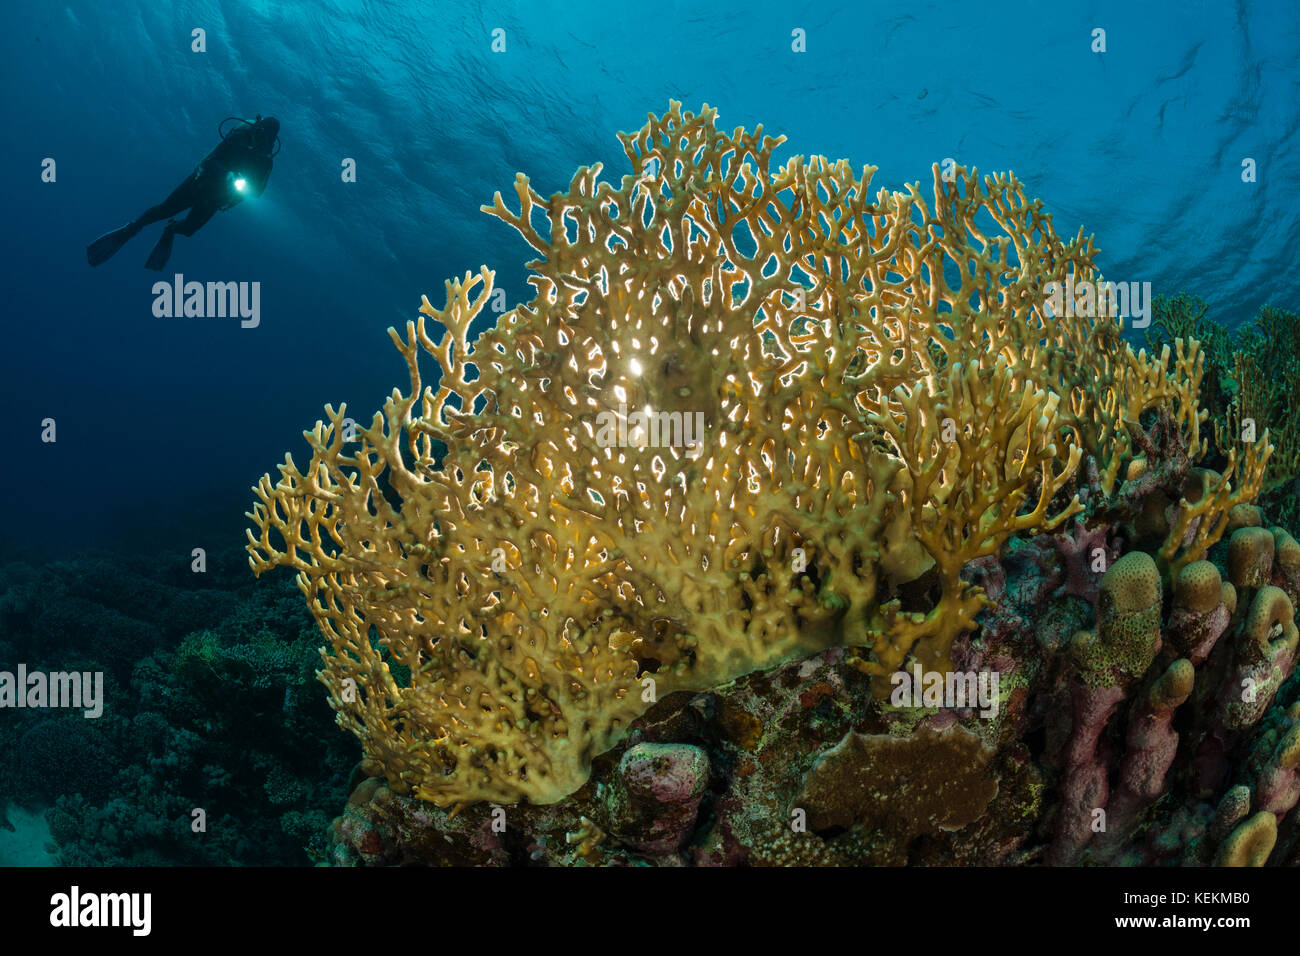 Scuba Diver over Fire Coral, Millepora dichotoma, Marsa Alam, Red Sea, Egypt - Stock Image